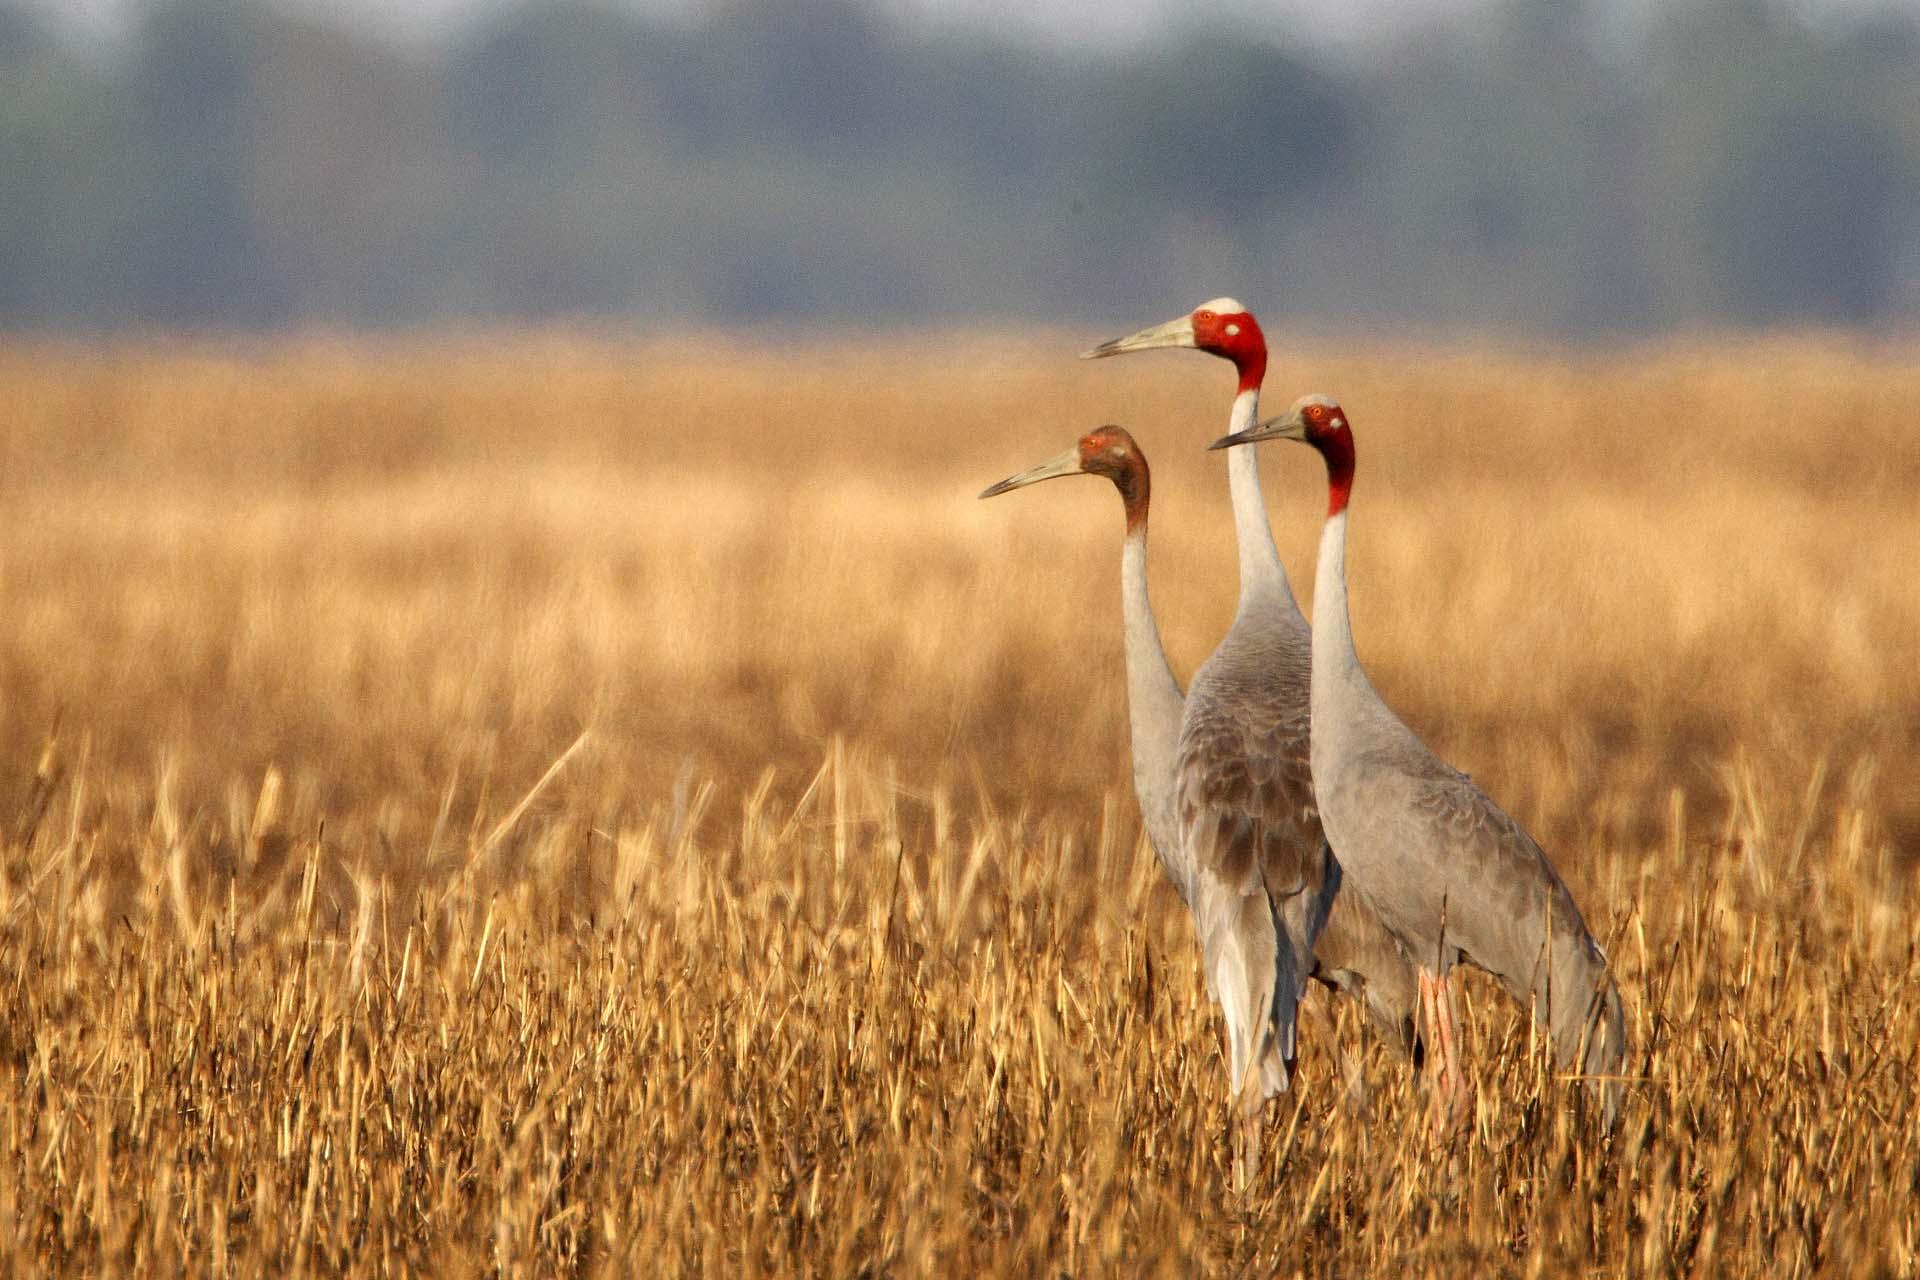 birding for Sarus Crane at Ang Trapeang Thmor